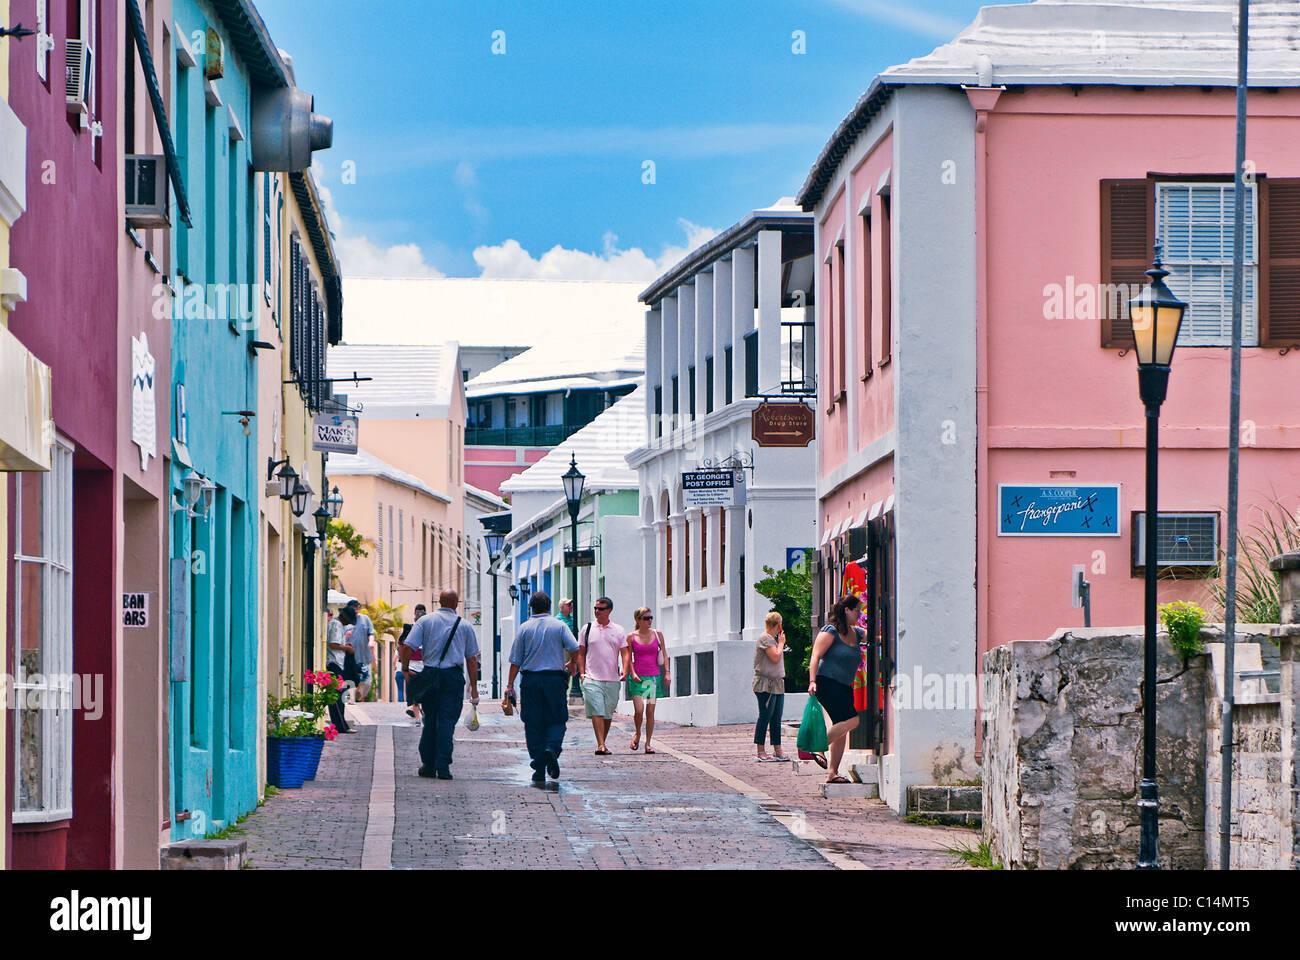 Quaint streets of St George Parish, Bermuda - Stock Image